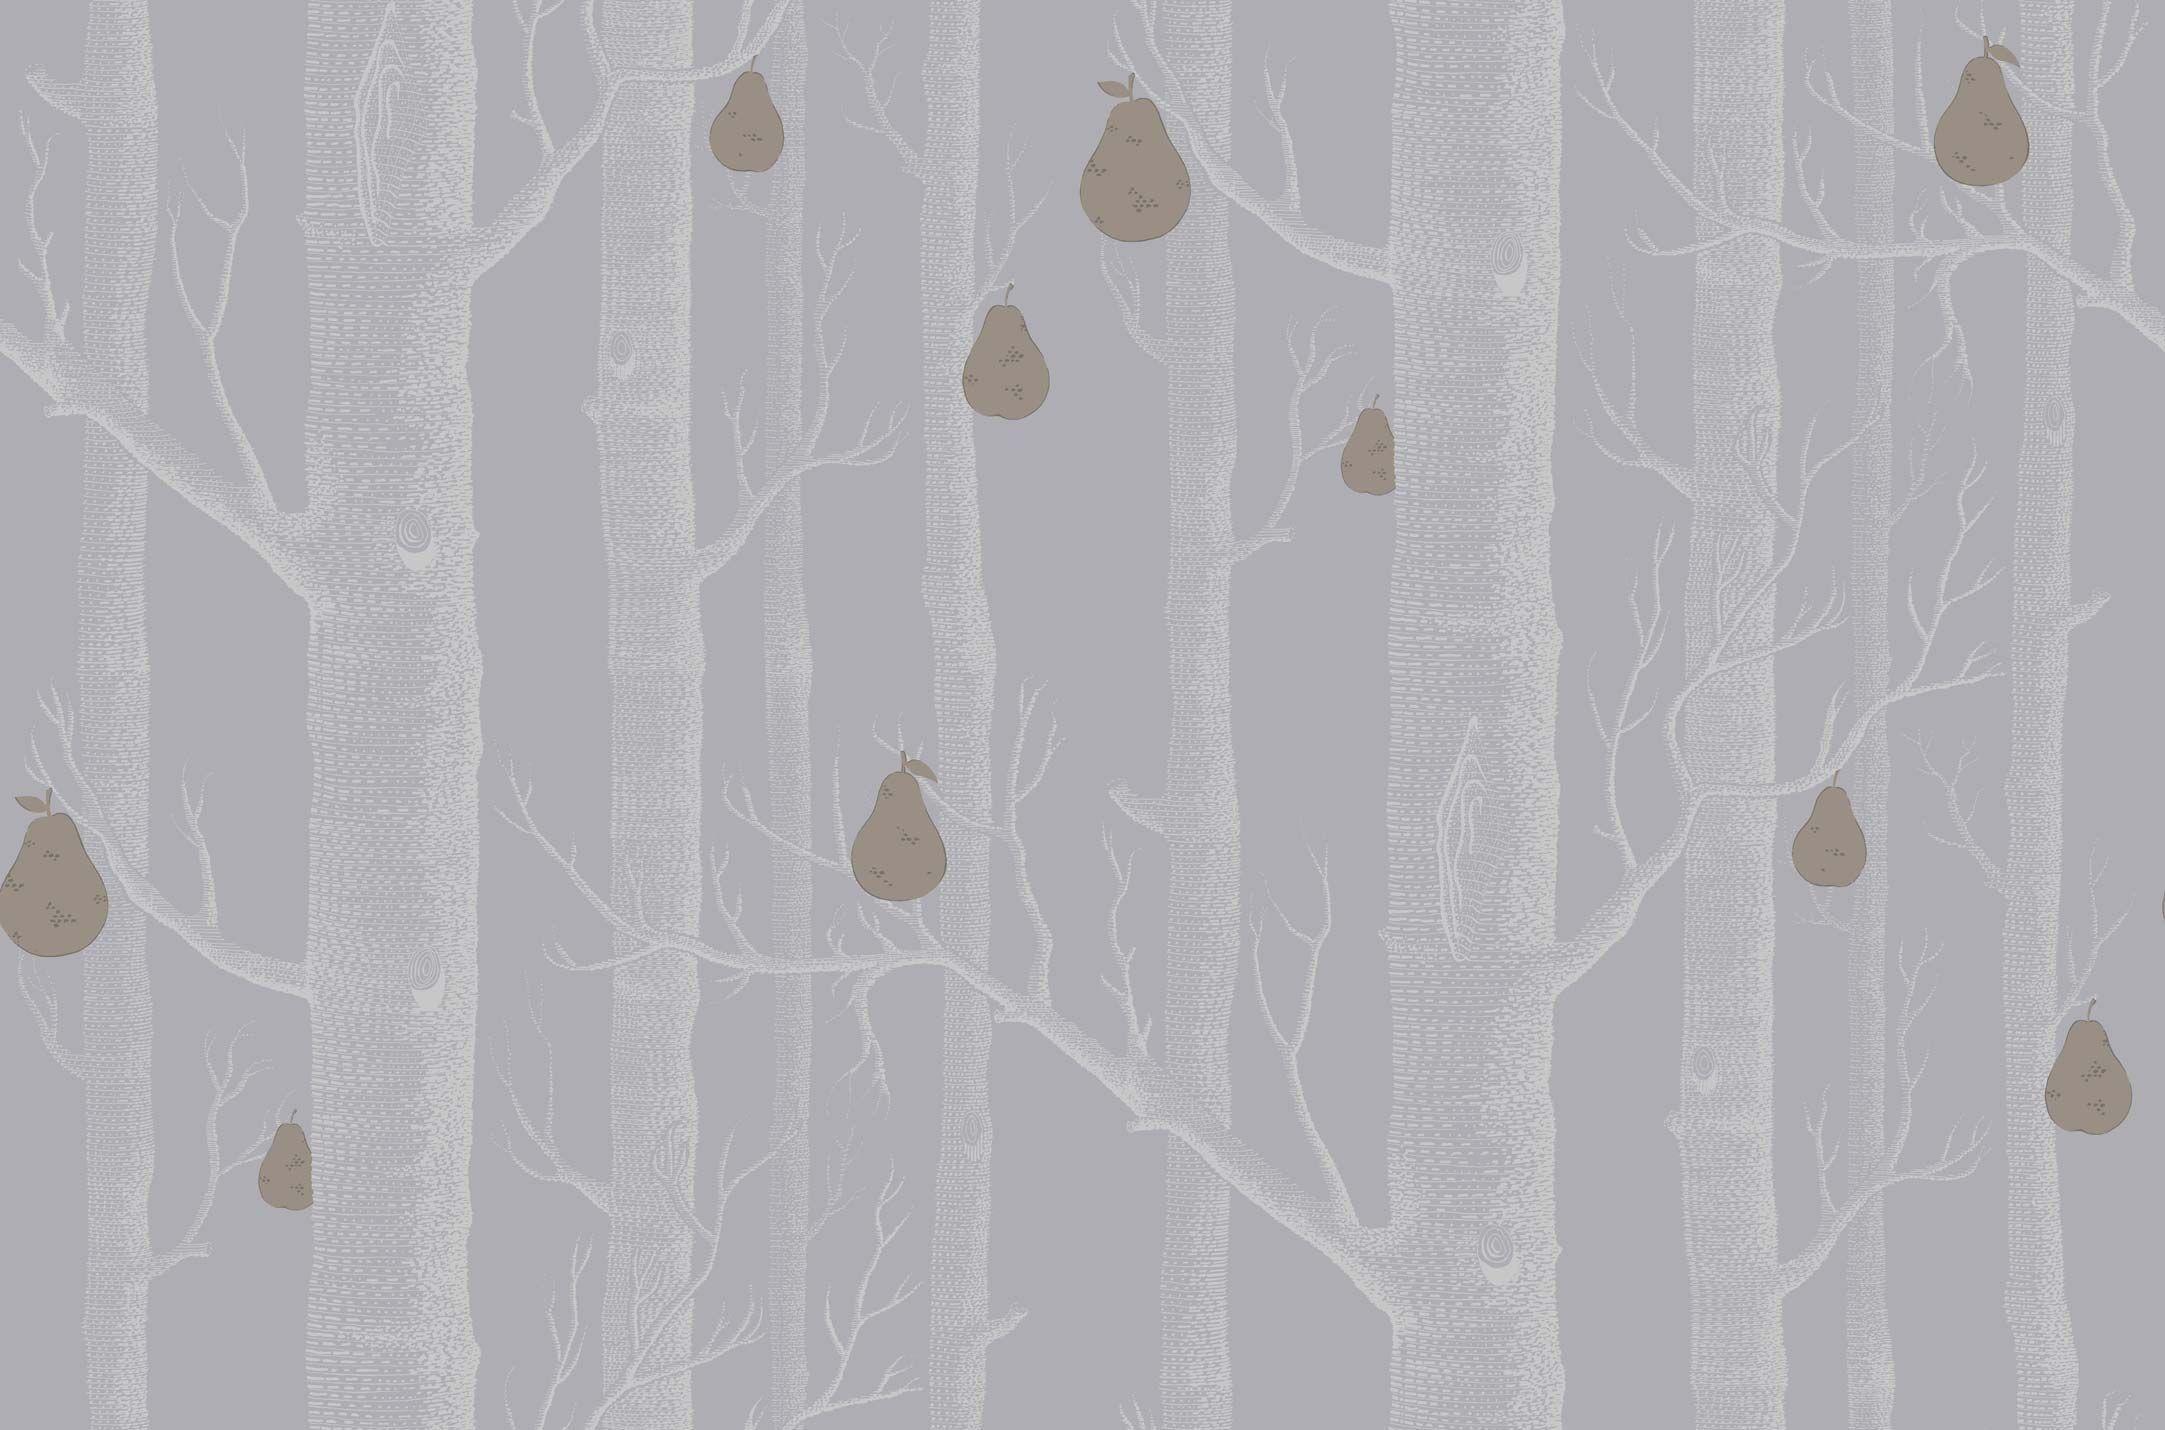 95 5030 Woods Pears Wallpaper Jojo Design Studio Cole And Son Wallpaper Birch Tree Wallpaper Wood Wallpaper